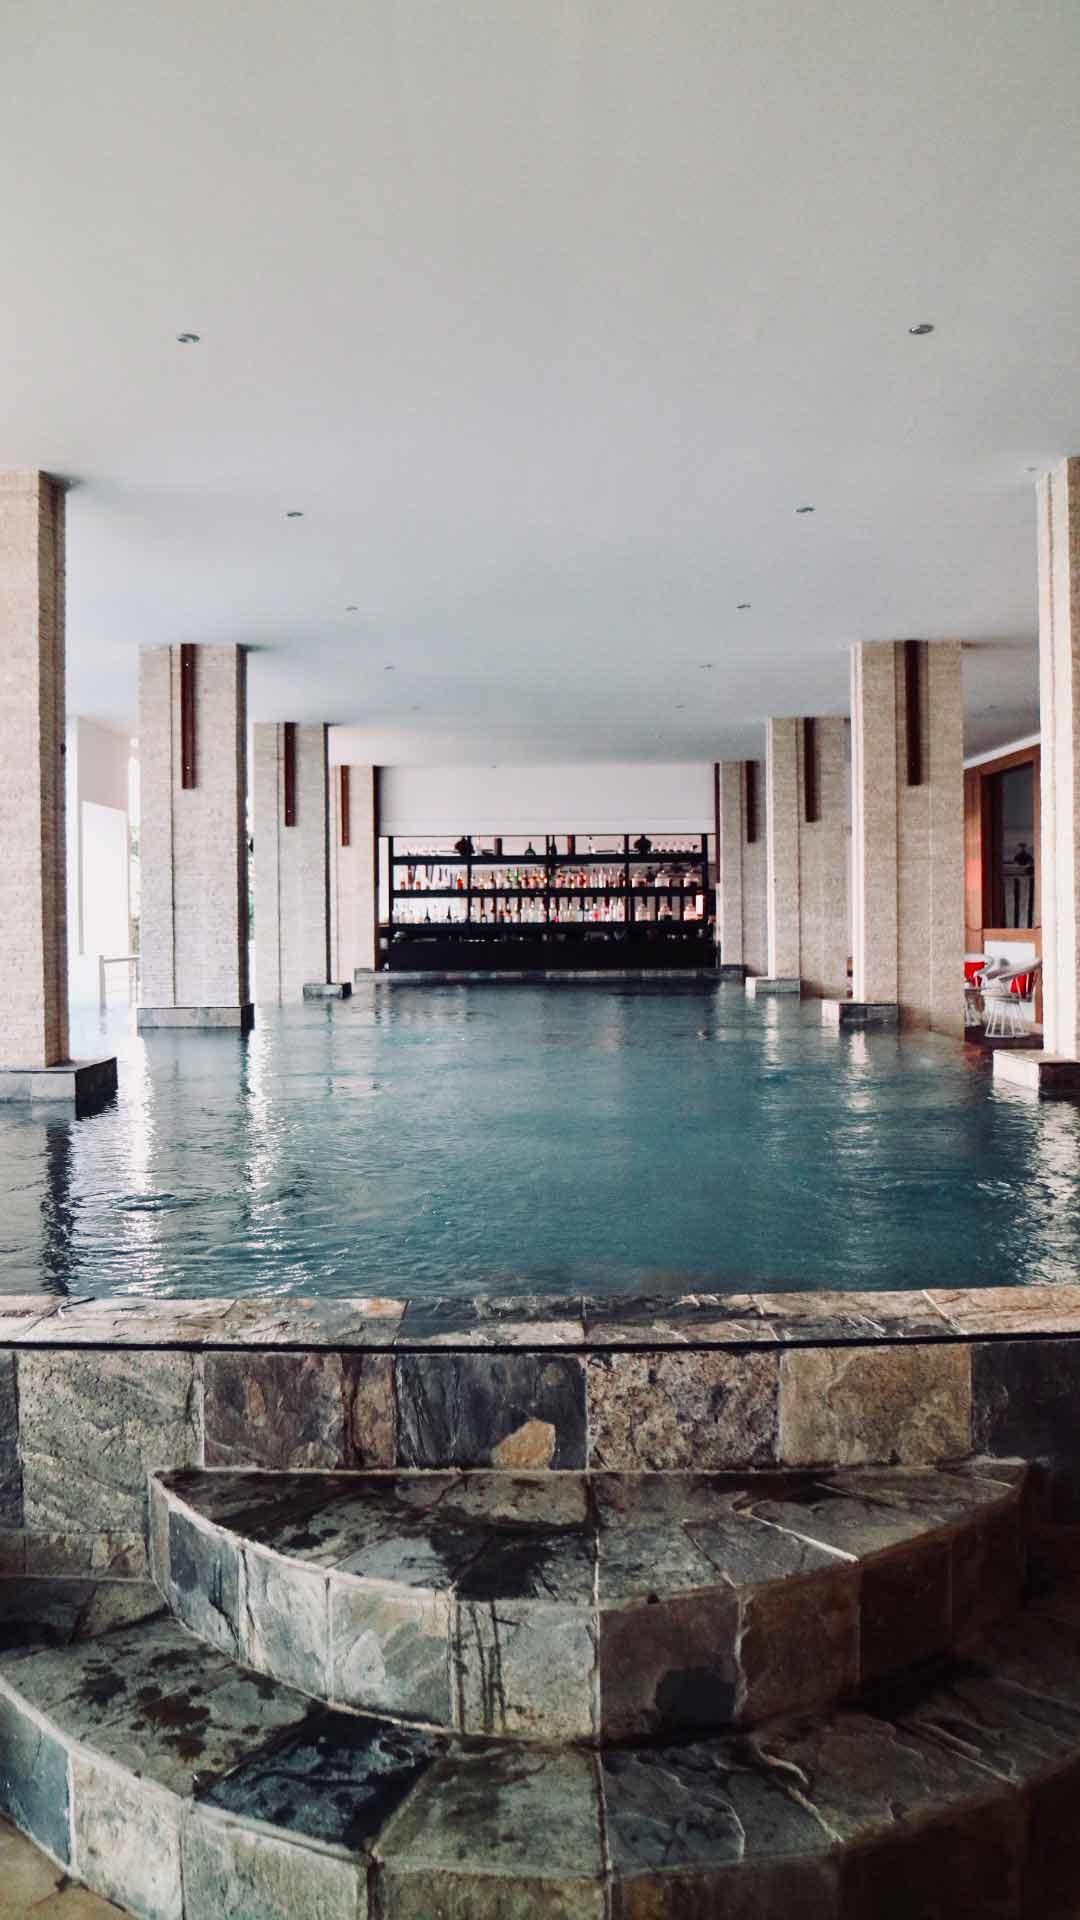 Baobab Tree Hotel & Spa's pool